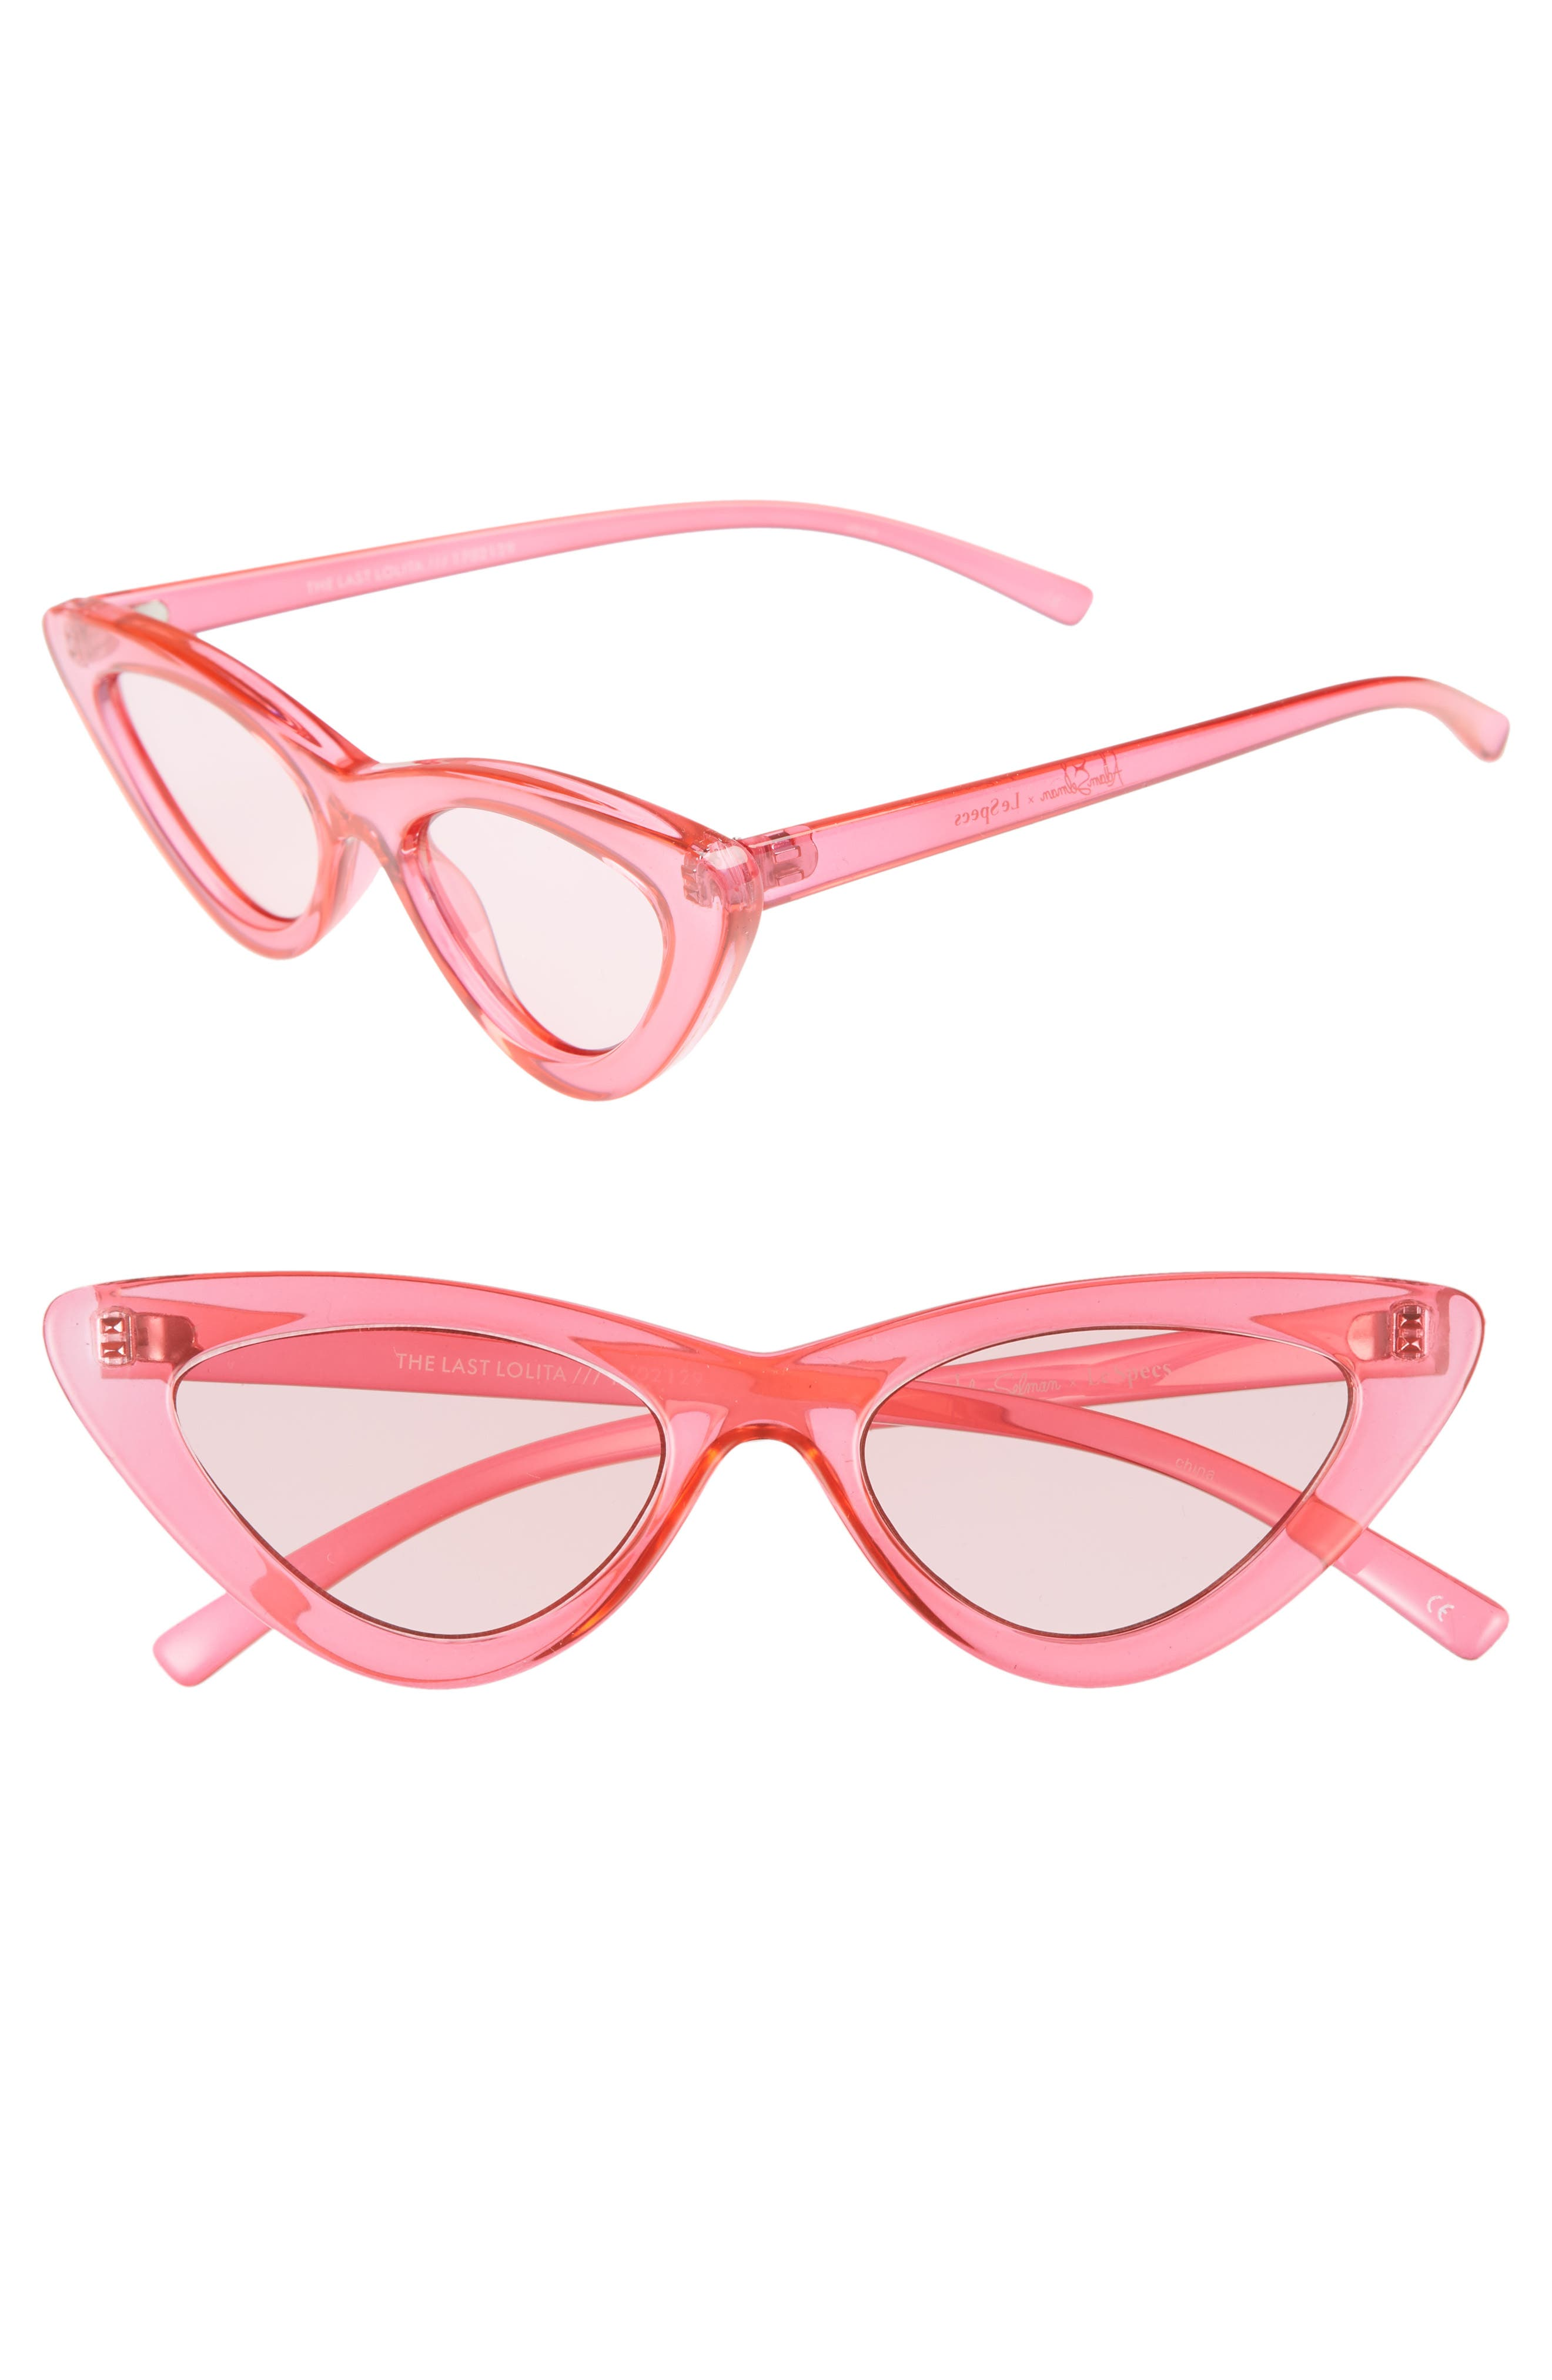 Last Lolita 49mm Cat Eye Sunglasses,                             Main thumbnail 1, color,                             Hot Pink